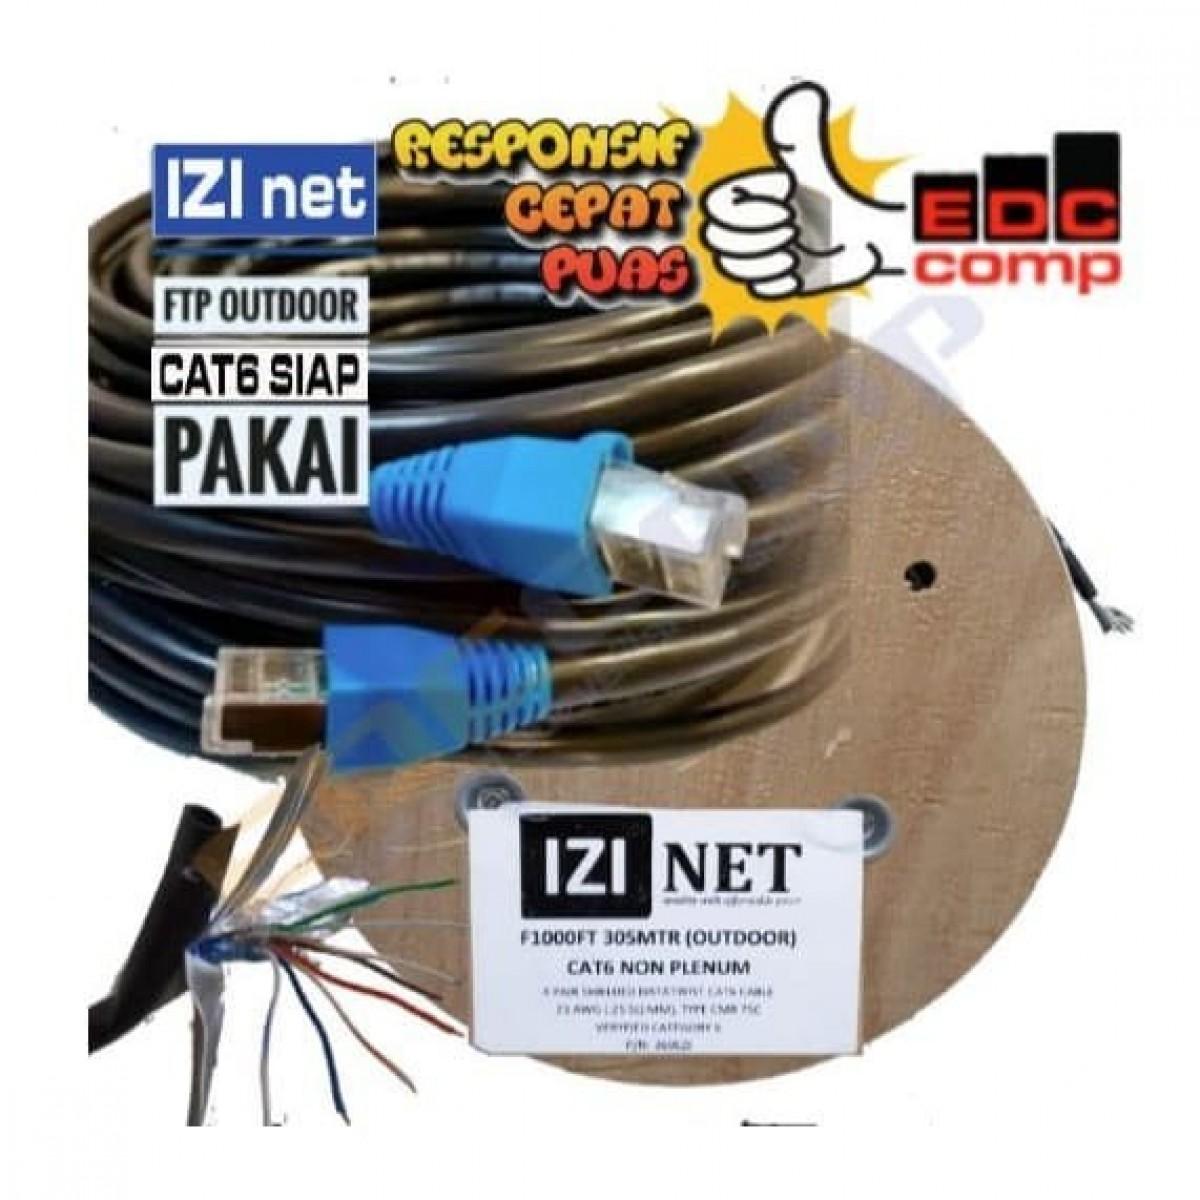 Cable STP/FTP Cat 6 Outdoor Cable 65 Meter IZI net Original - EdcComp